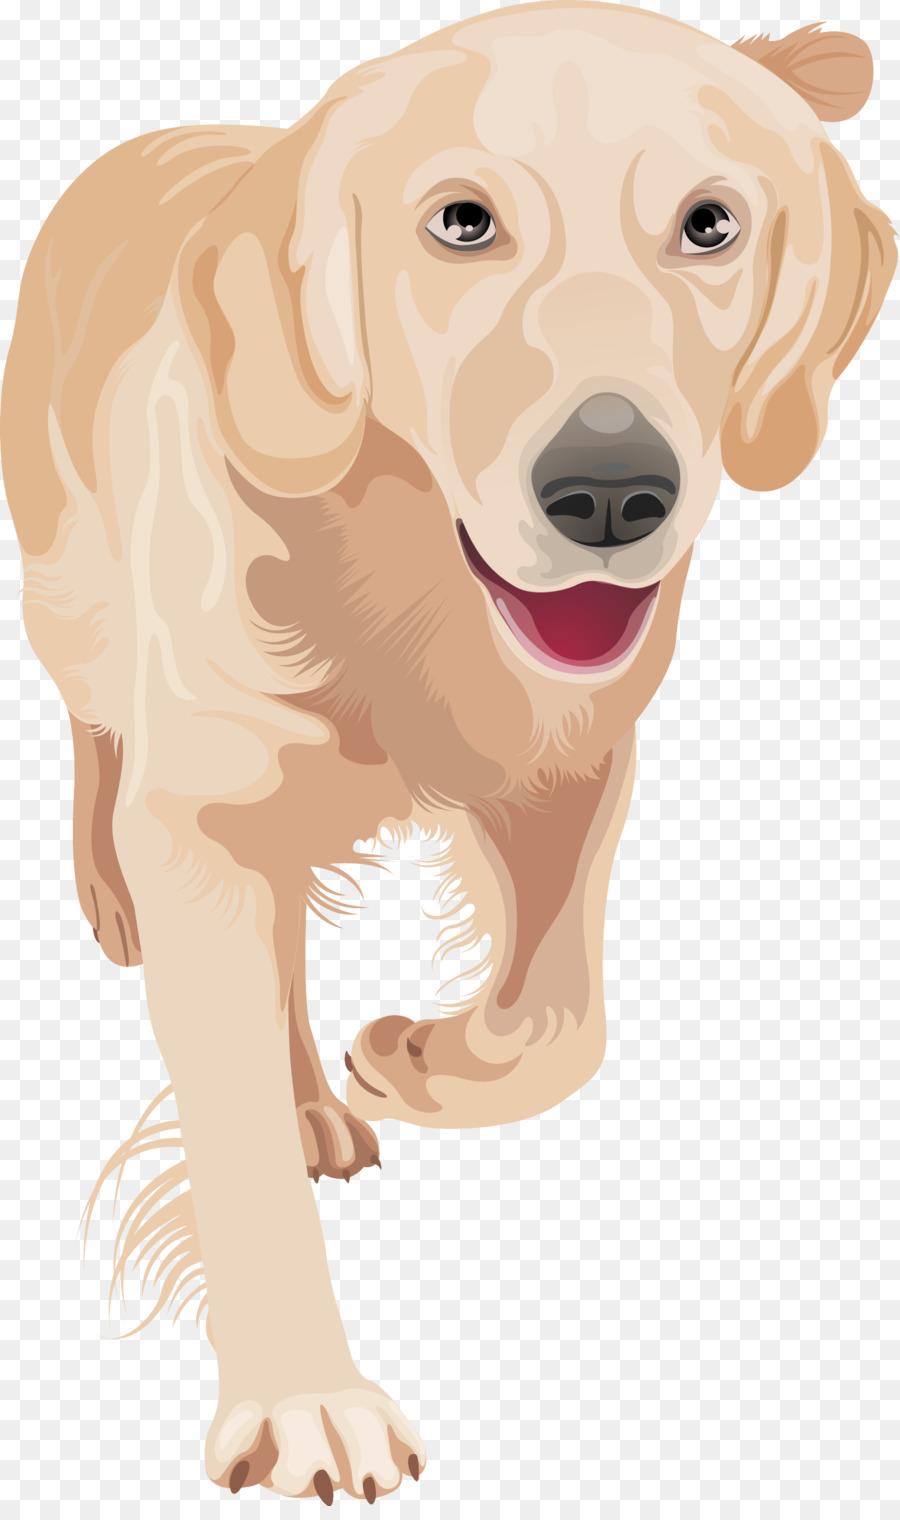 Descarga gratuita de Golden Retriever, Labrador Retriever, Cachorro imágenes PNG